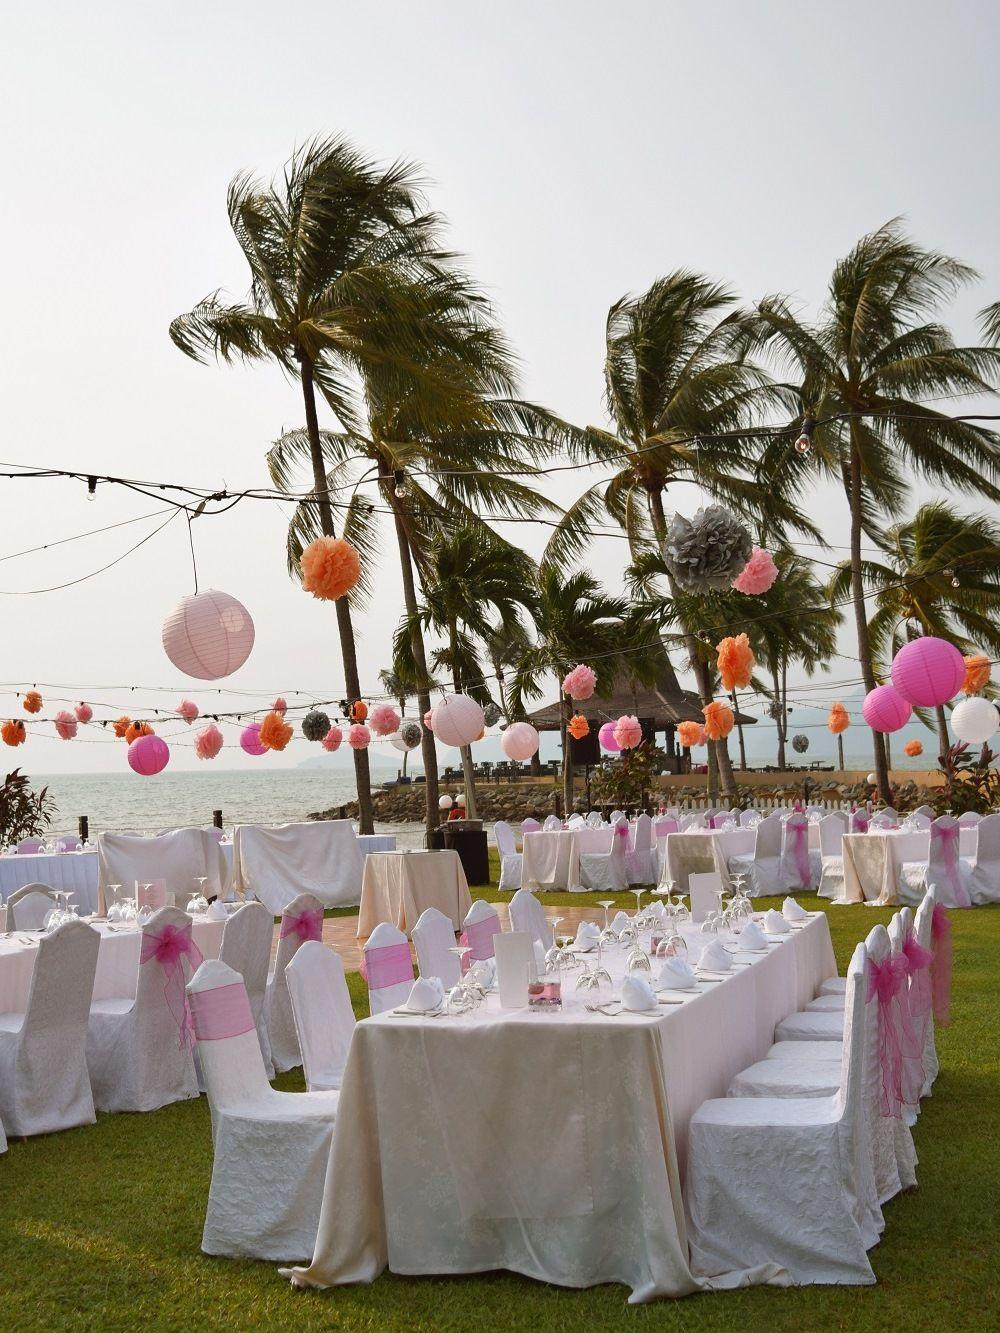 A dreamy sunset wedding at tanjung garden with ocean view at a dreamy sunset wedding at tanjung garden with ocean view at shangri sunset weddingkota kinabaluresort spa junglespirit Images